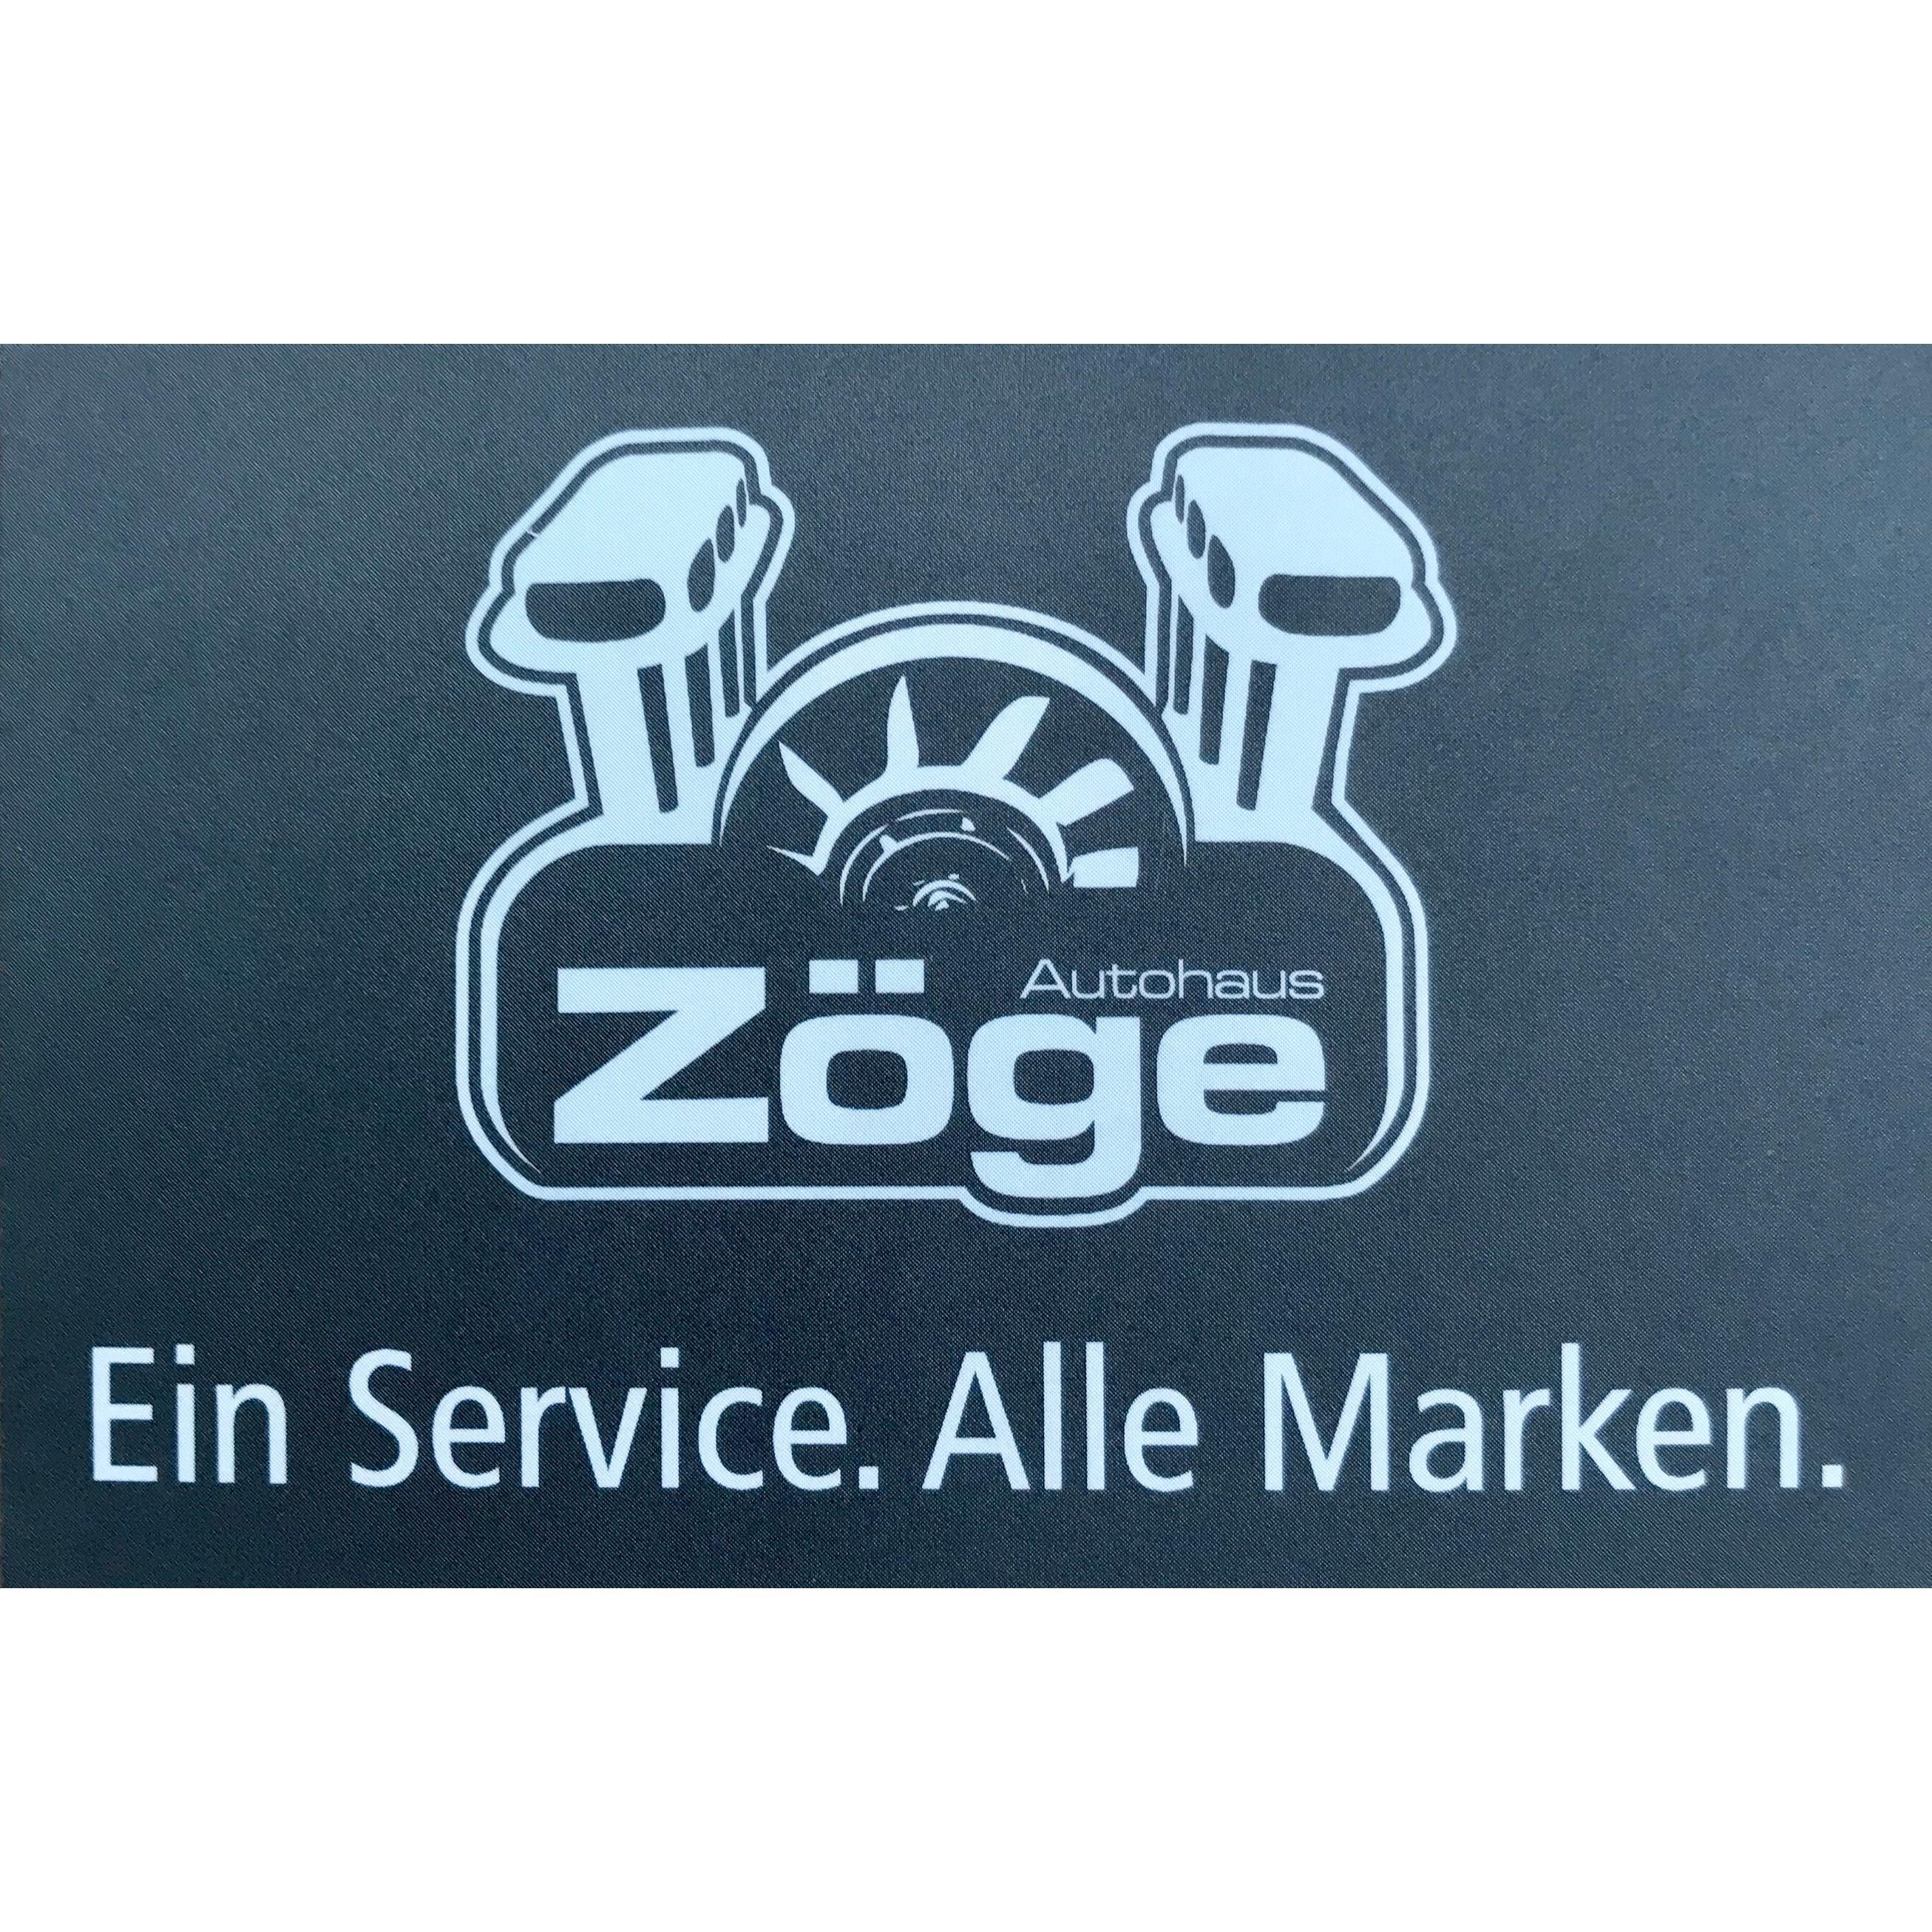 Bild zu Autohaus Zöge MAZDA SUBARU in Mansfeld im Südharz